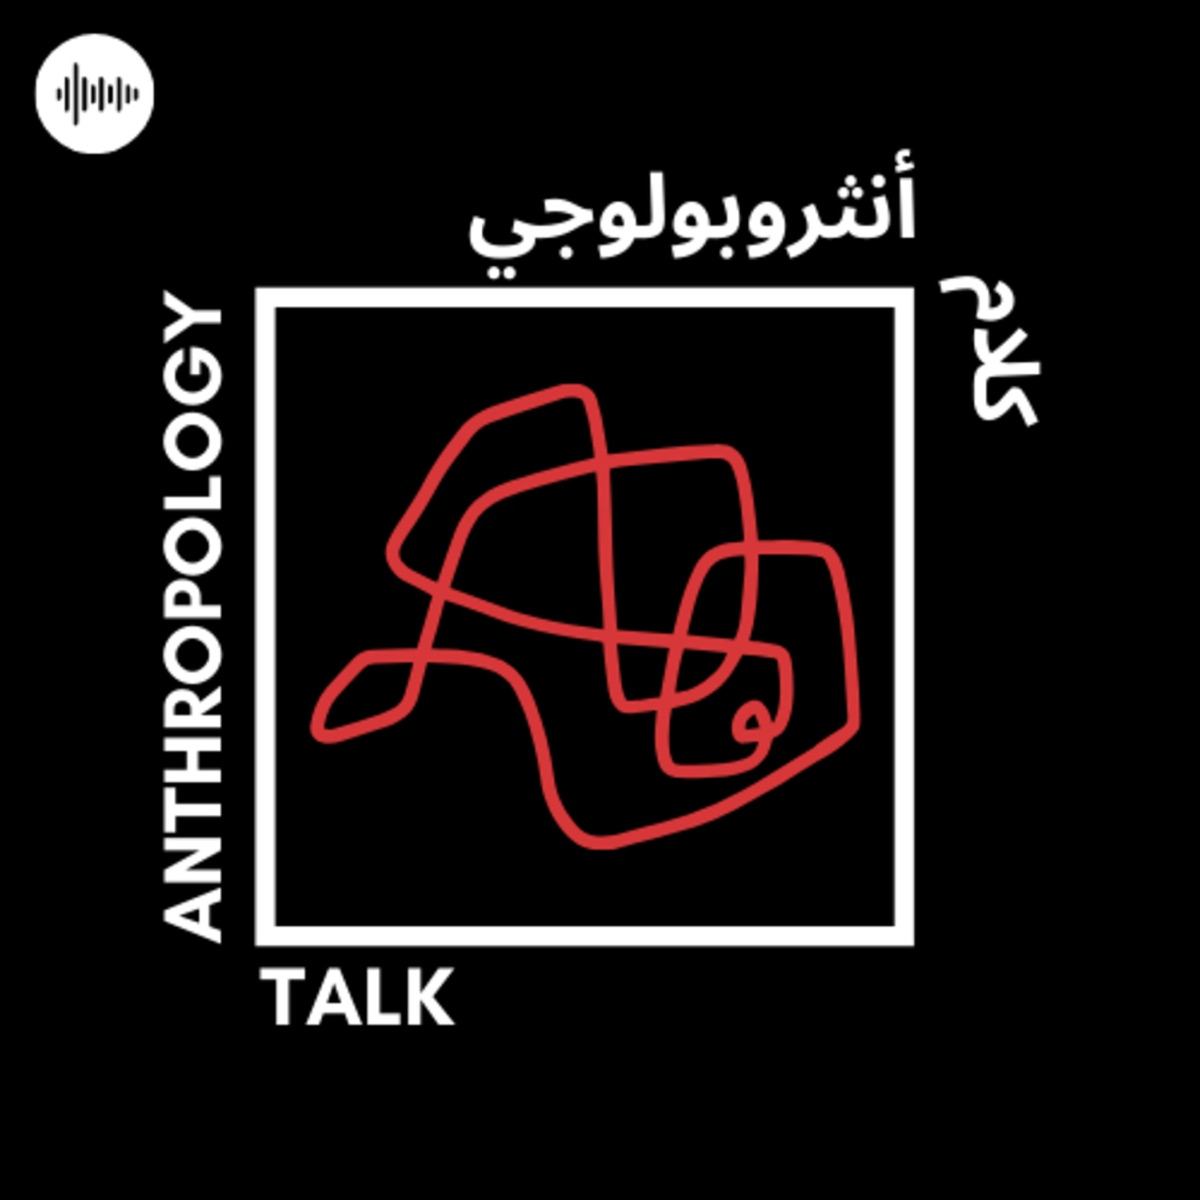 ANTH TALK | كلام أنثروبولوجي